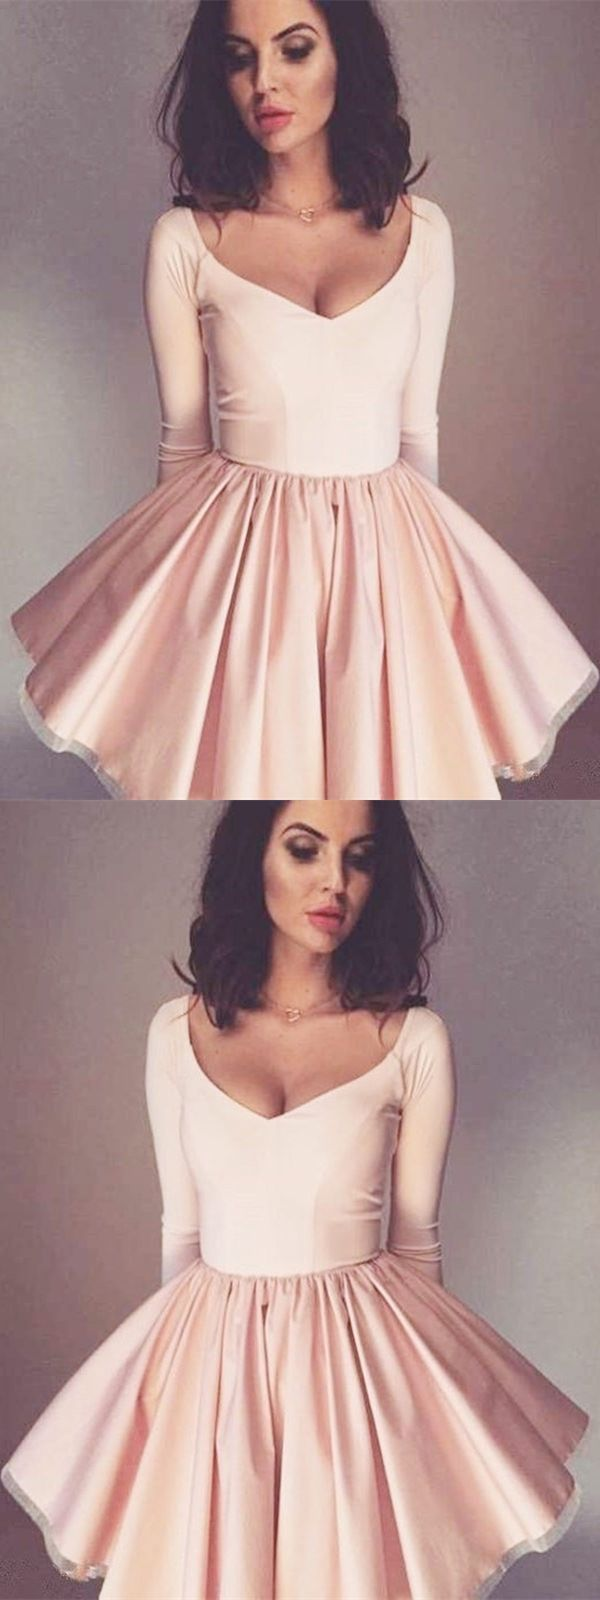 Aline vneck long sleeves pink short homecoming dress k